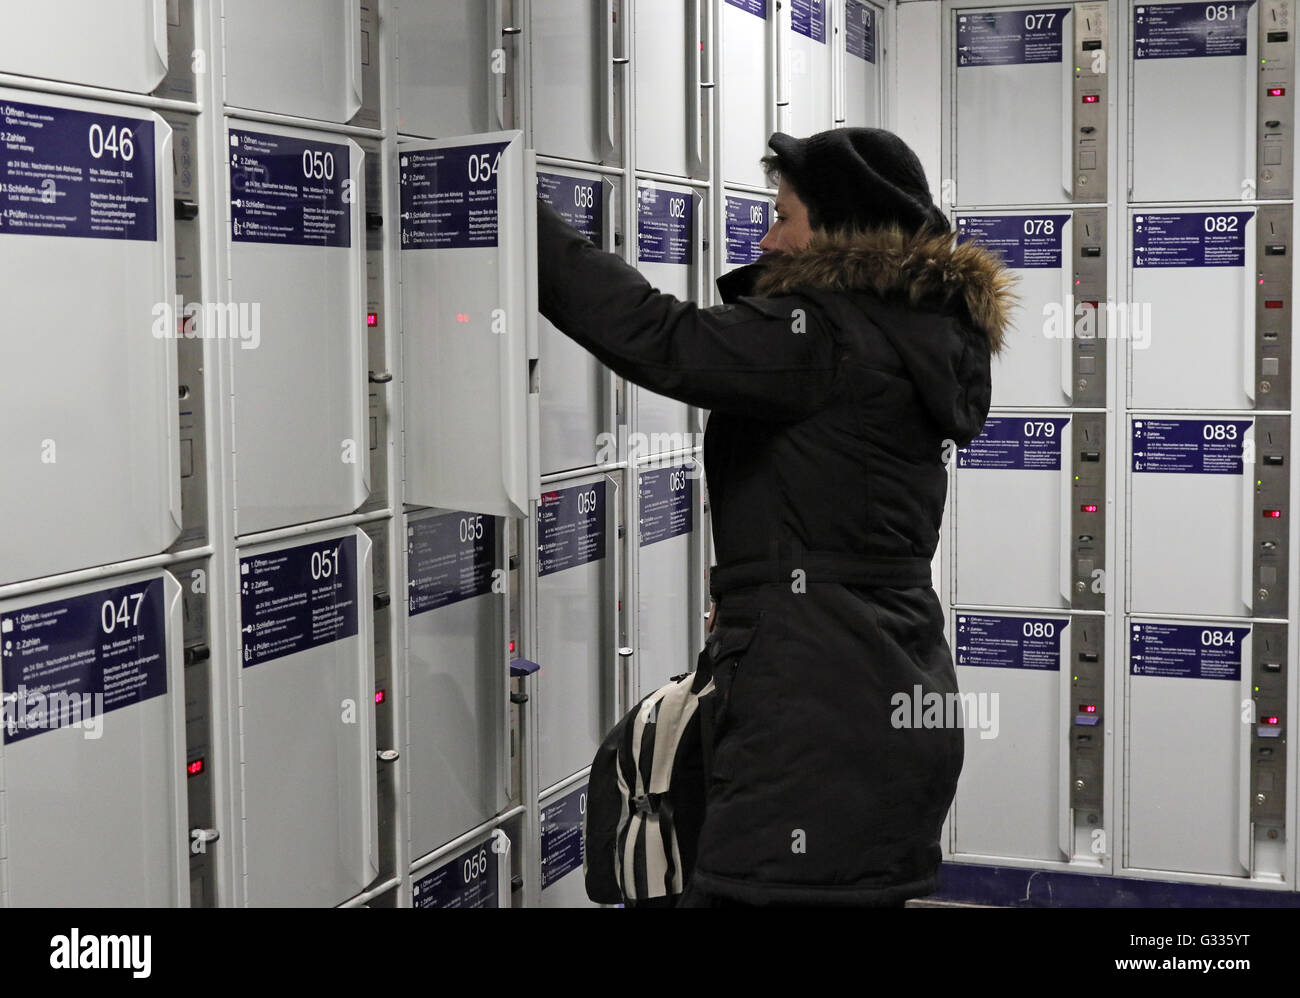 Berlino, Germania, donna usa un Bahnhofsschliessfach Immagini Stock